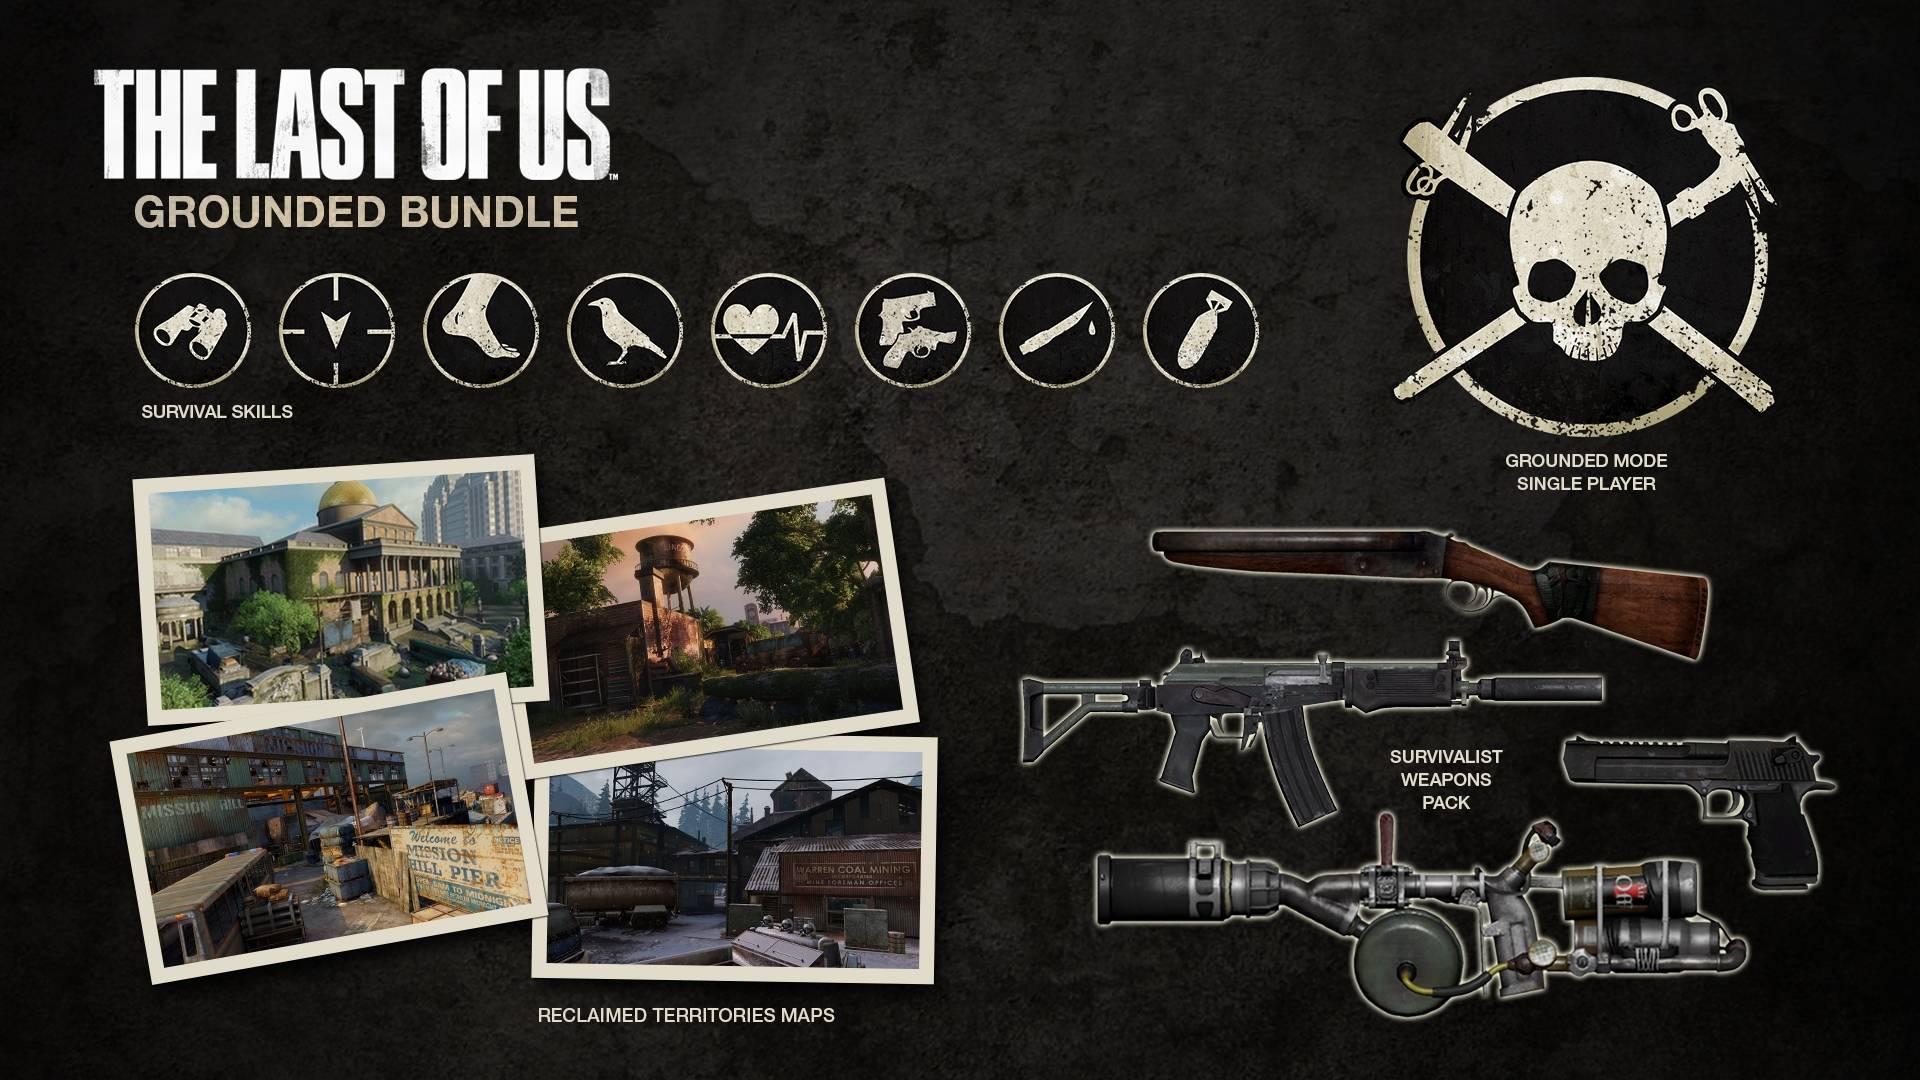 The Last of Us: Neue Maps, Skills und Waffen - Shooter-sZene